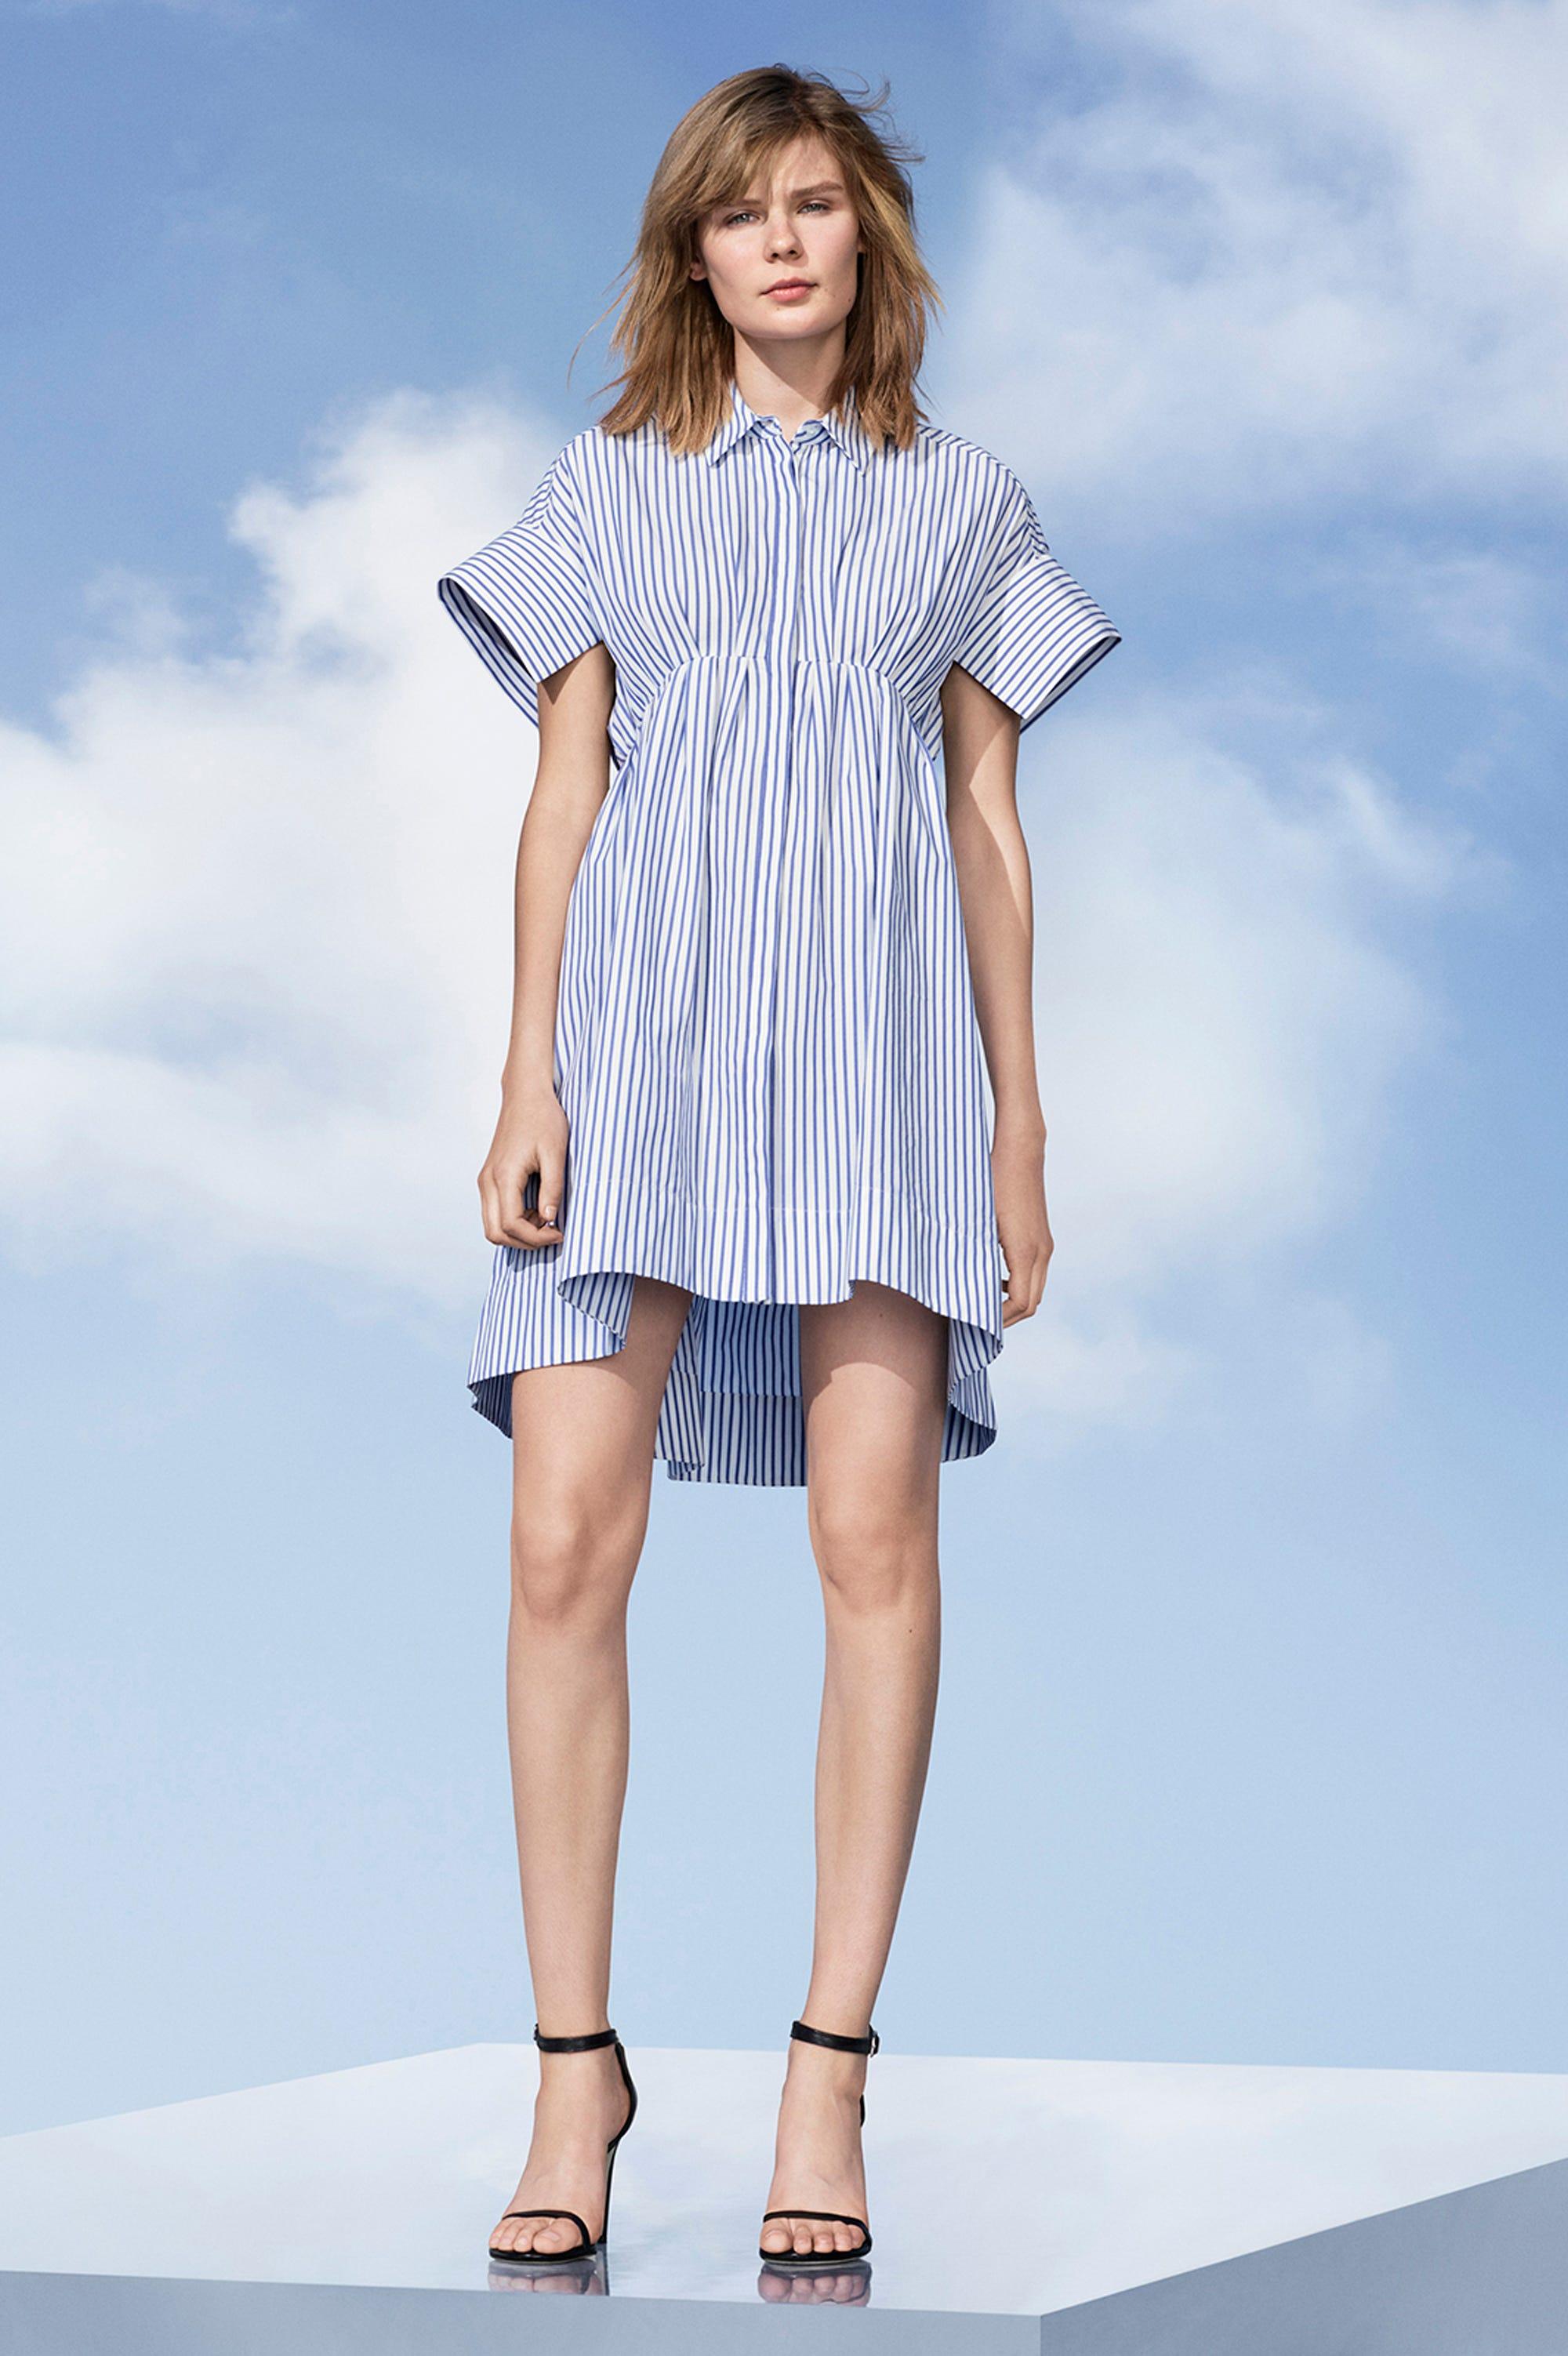 329676cccc3ba Target Sale Victoria Beckham Clothing Line Discounts